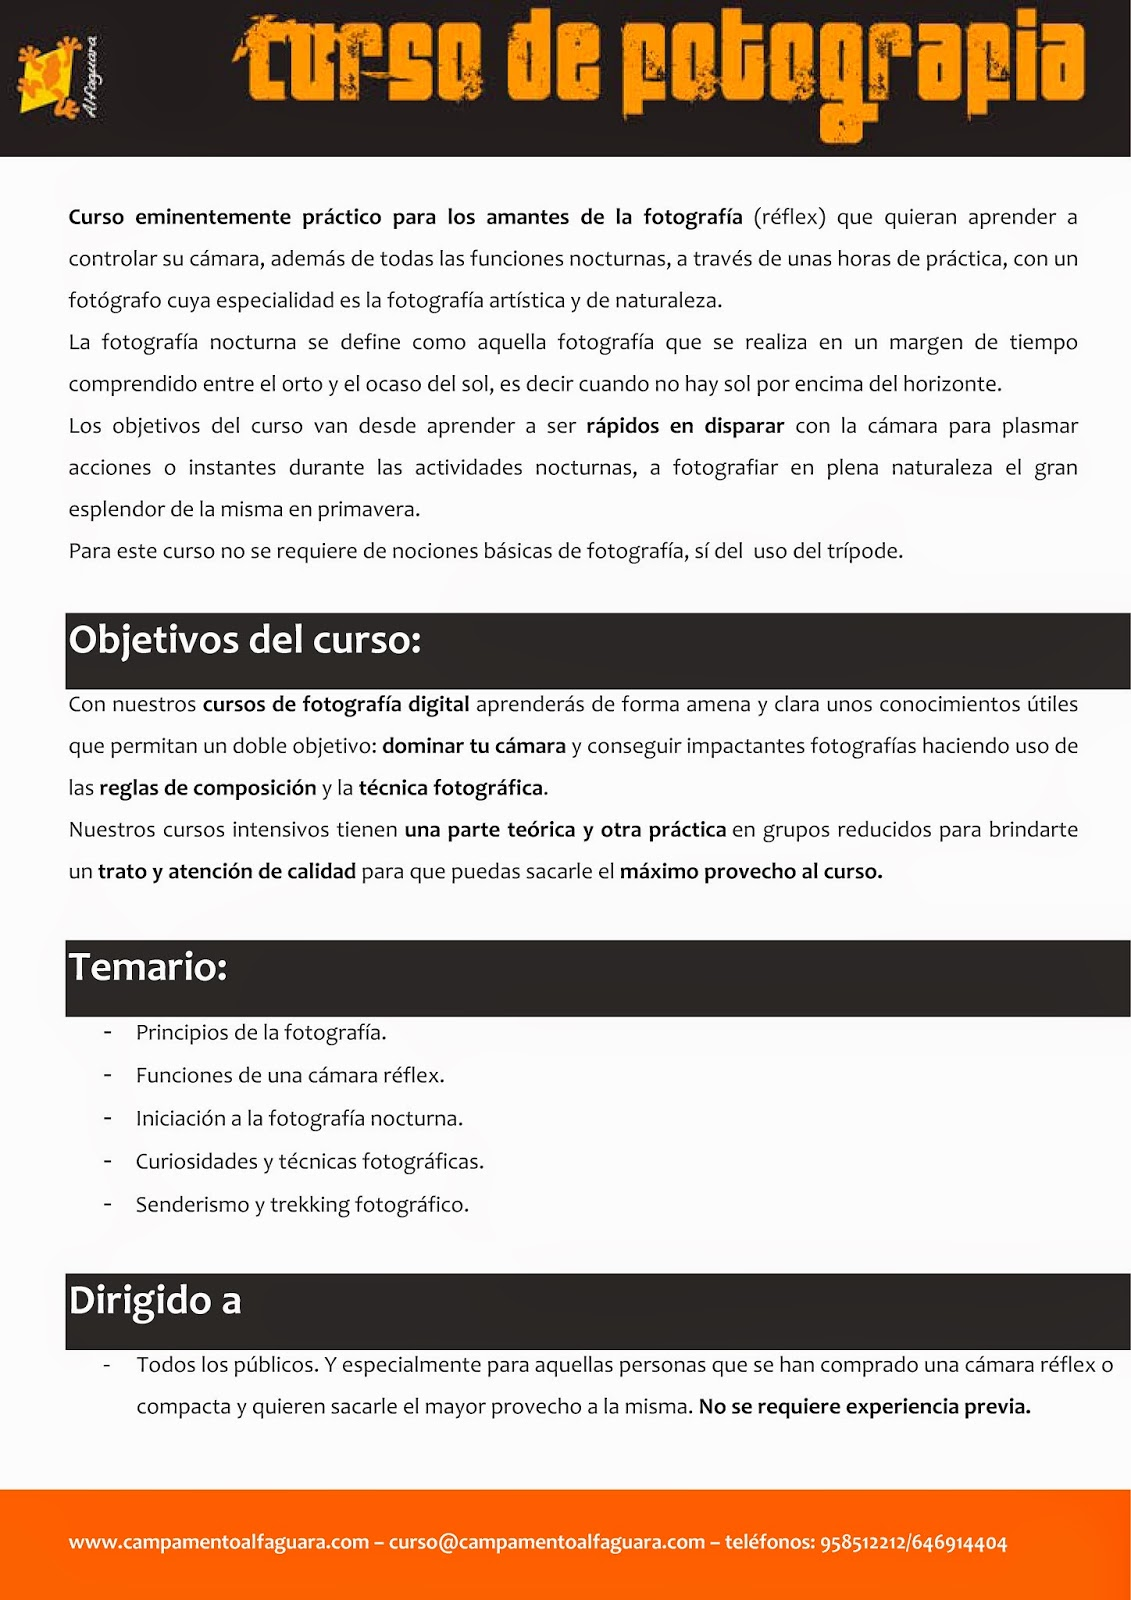 www.campamentoalfaguara.com/ficha_tecnica_foto.pdf